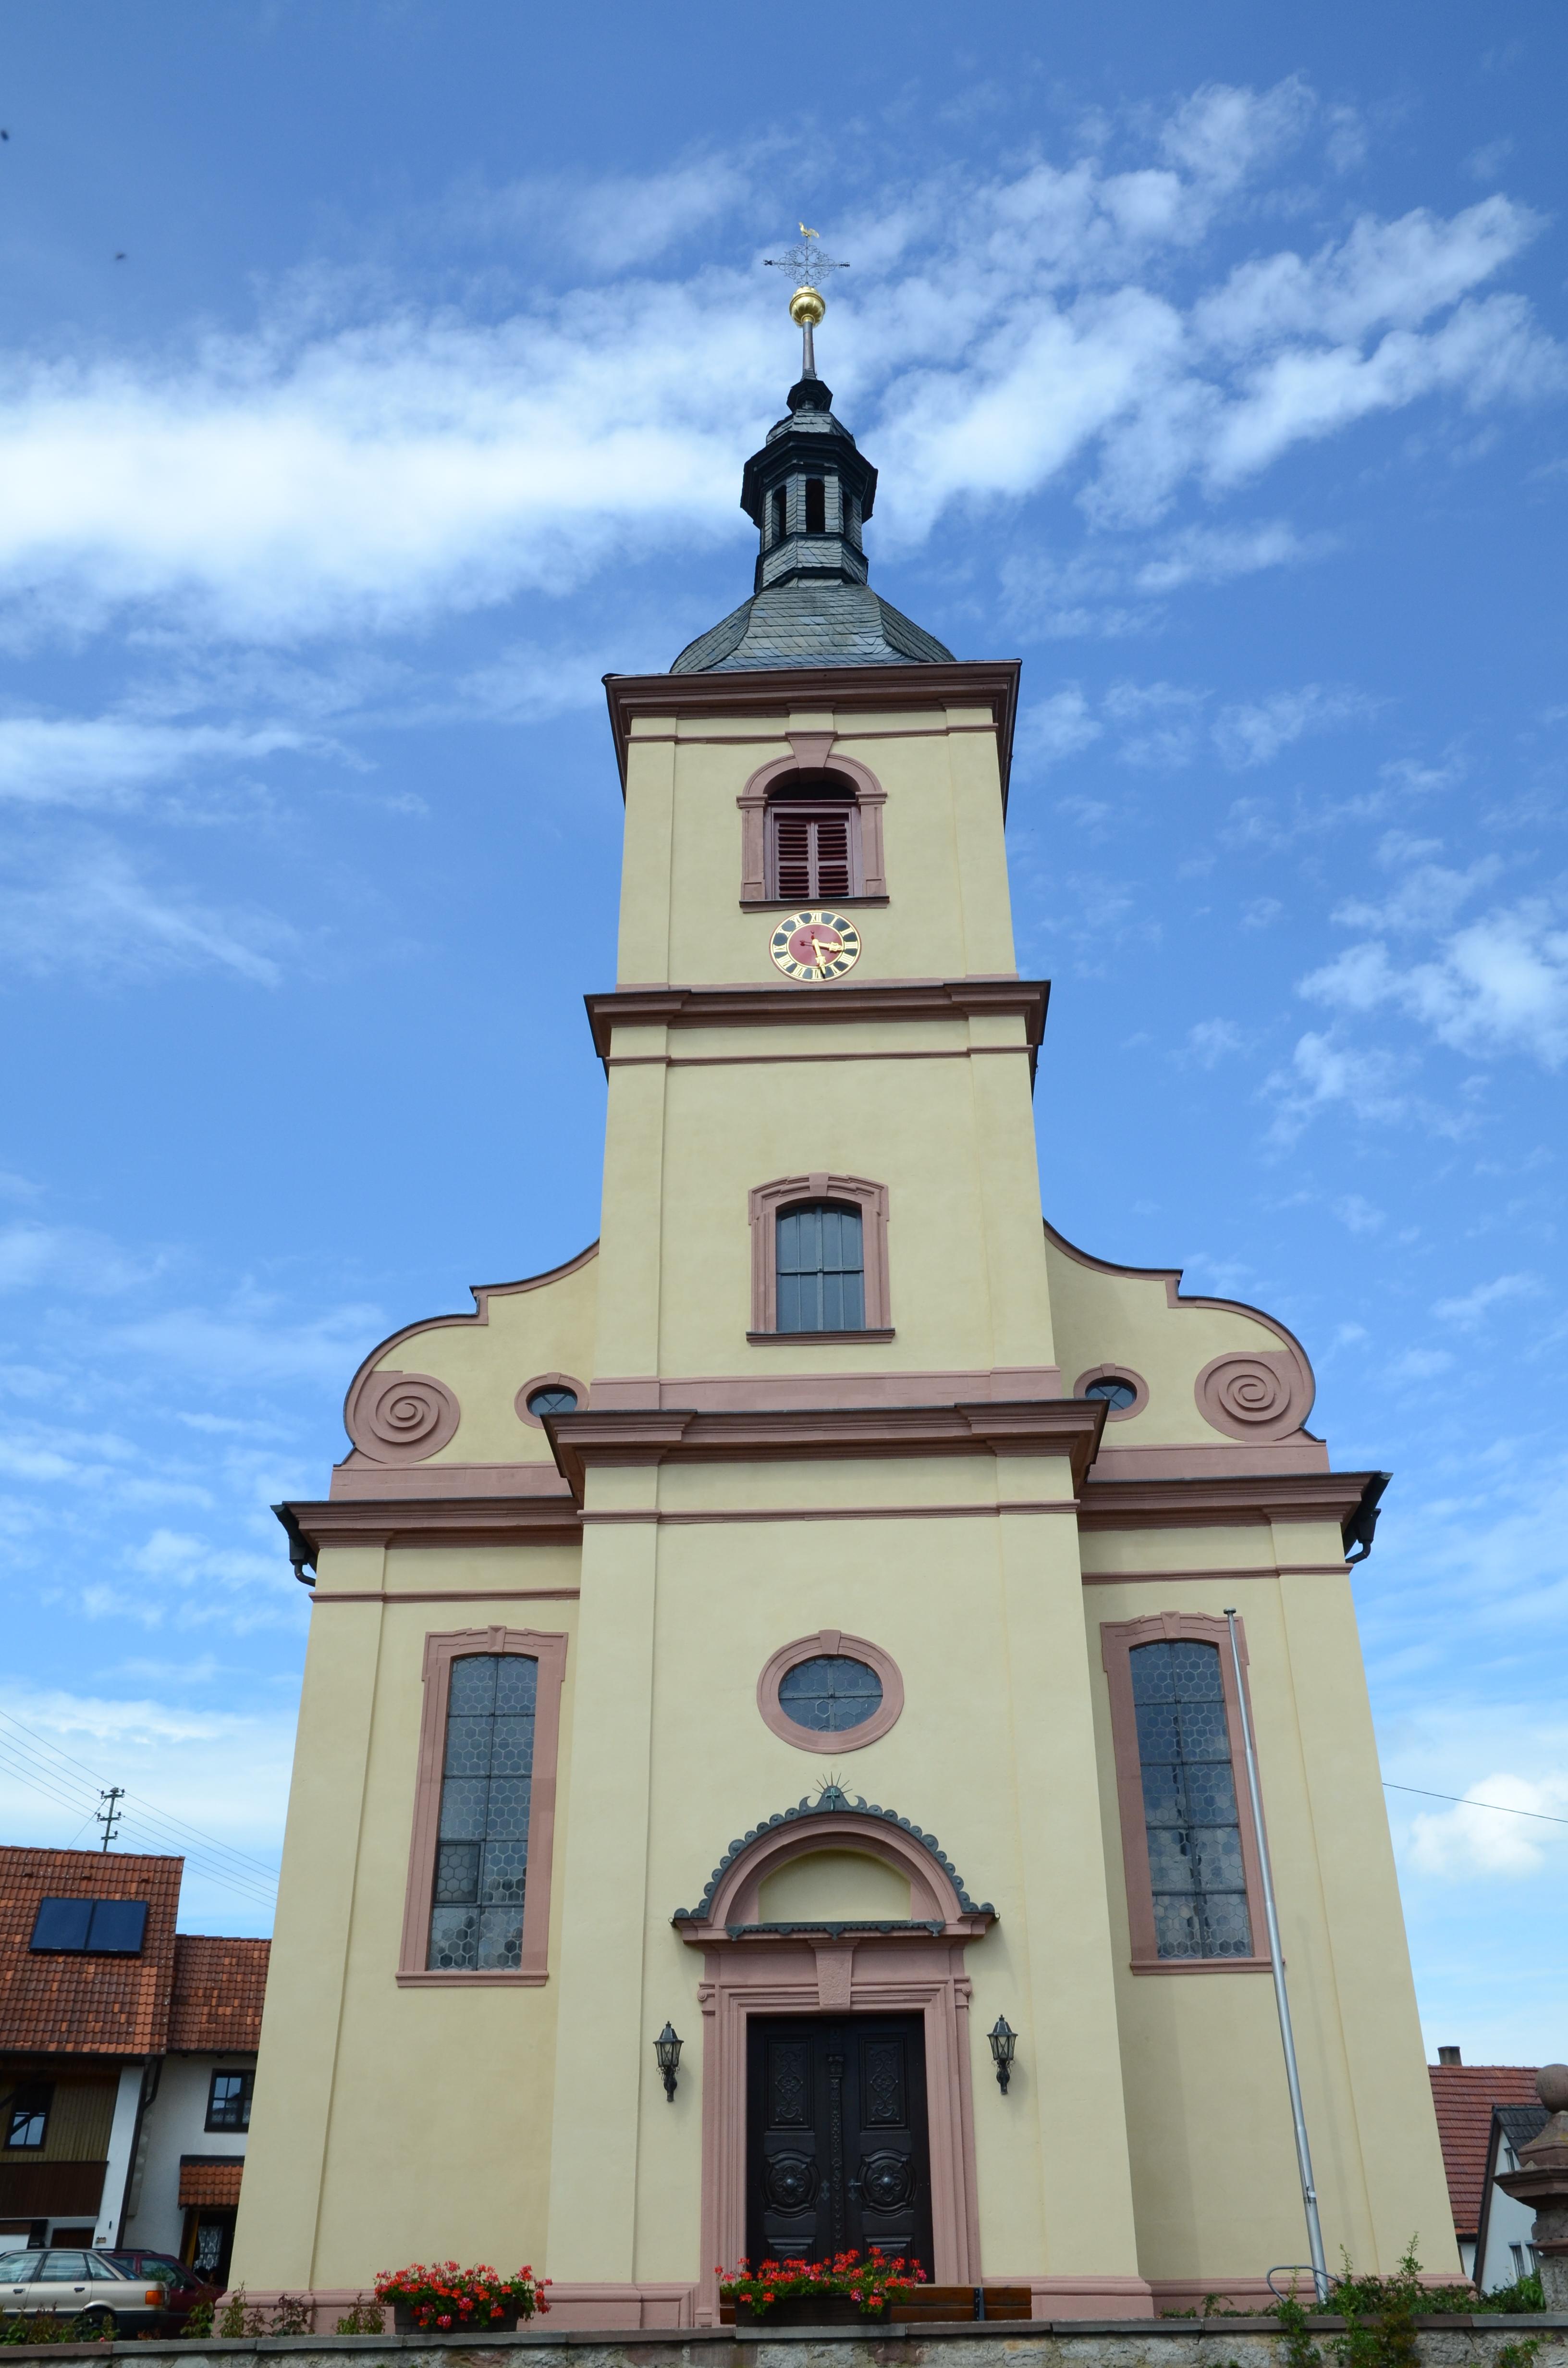 Karsbach